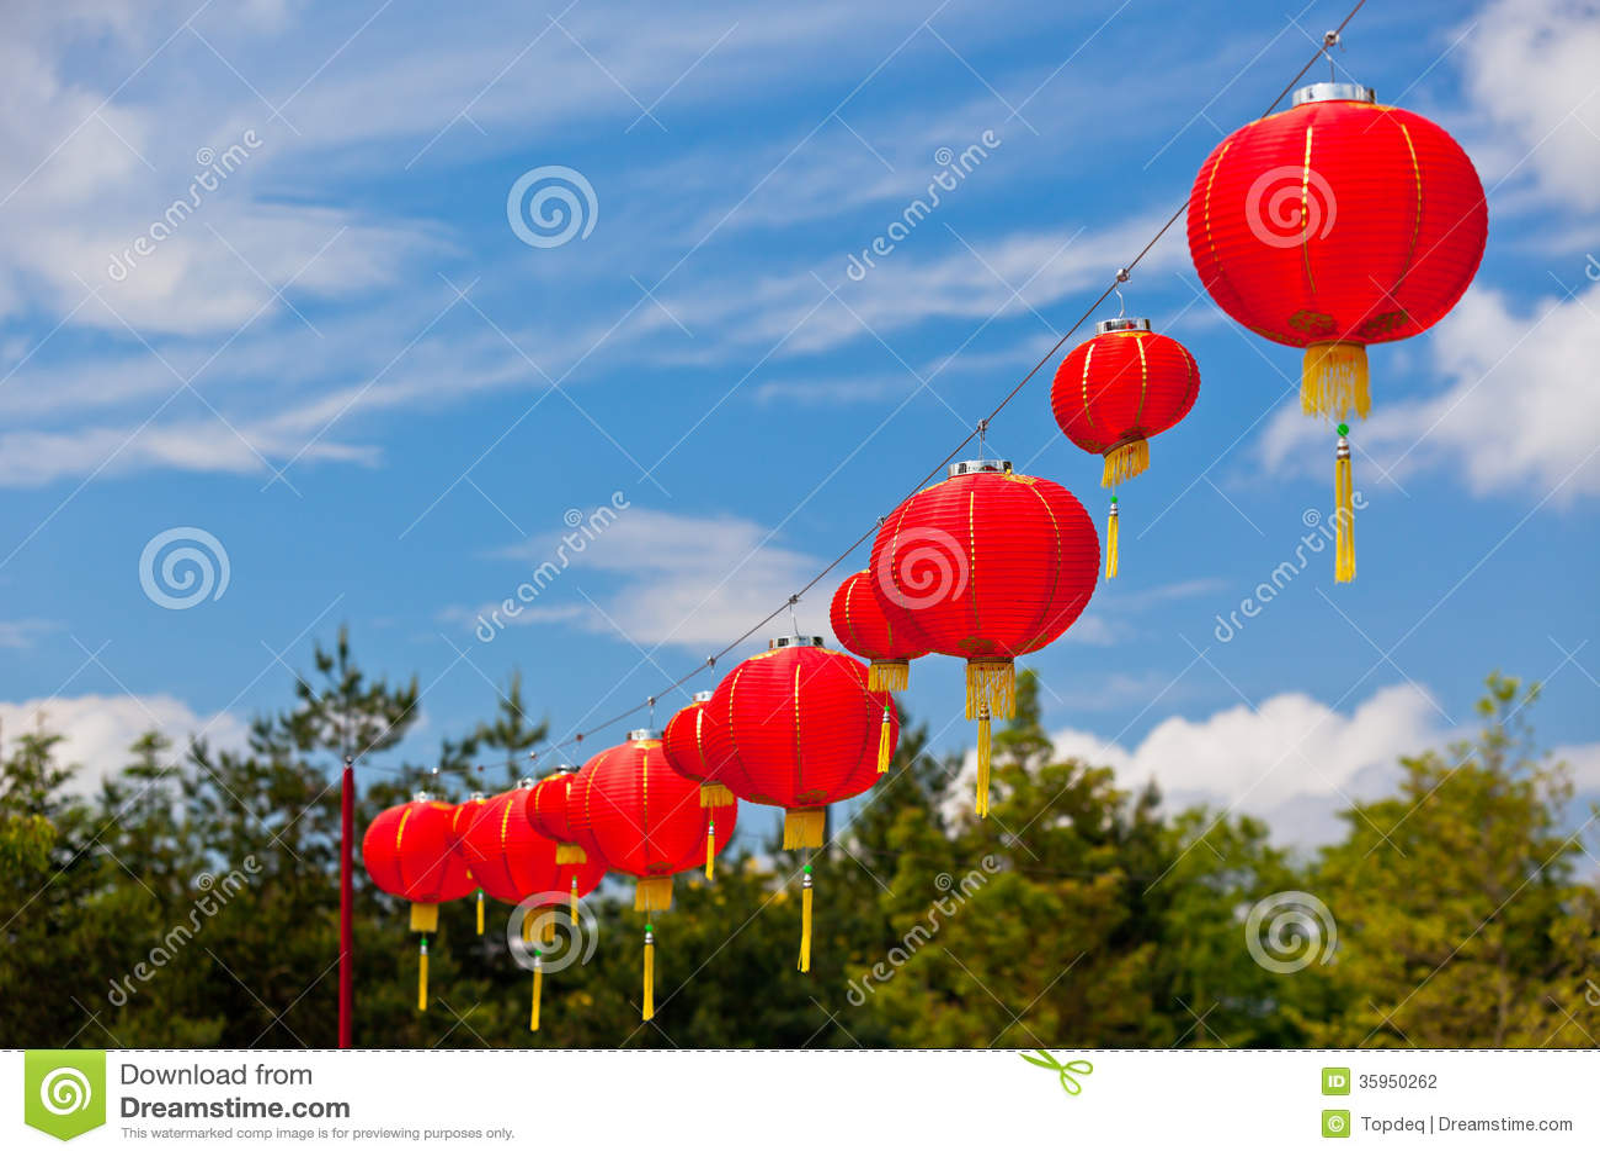 Linternas de papel chinas rojas contra un cielo azul